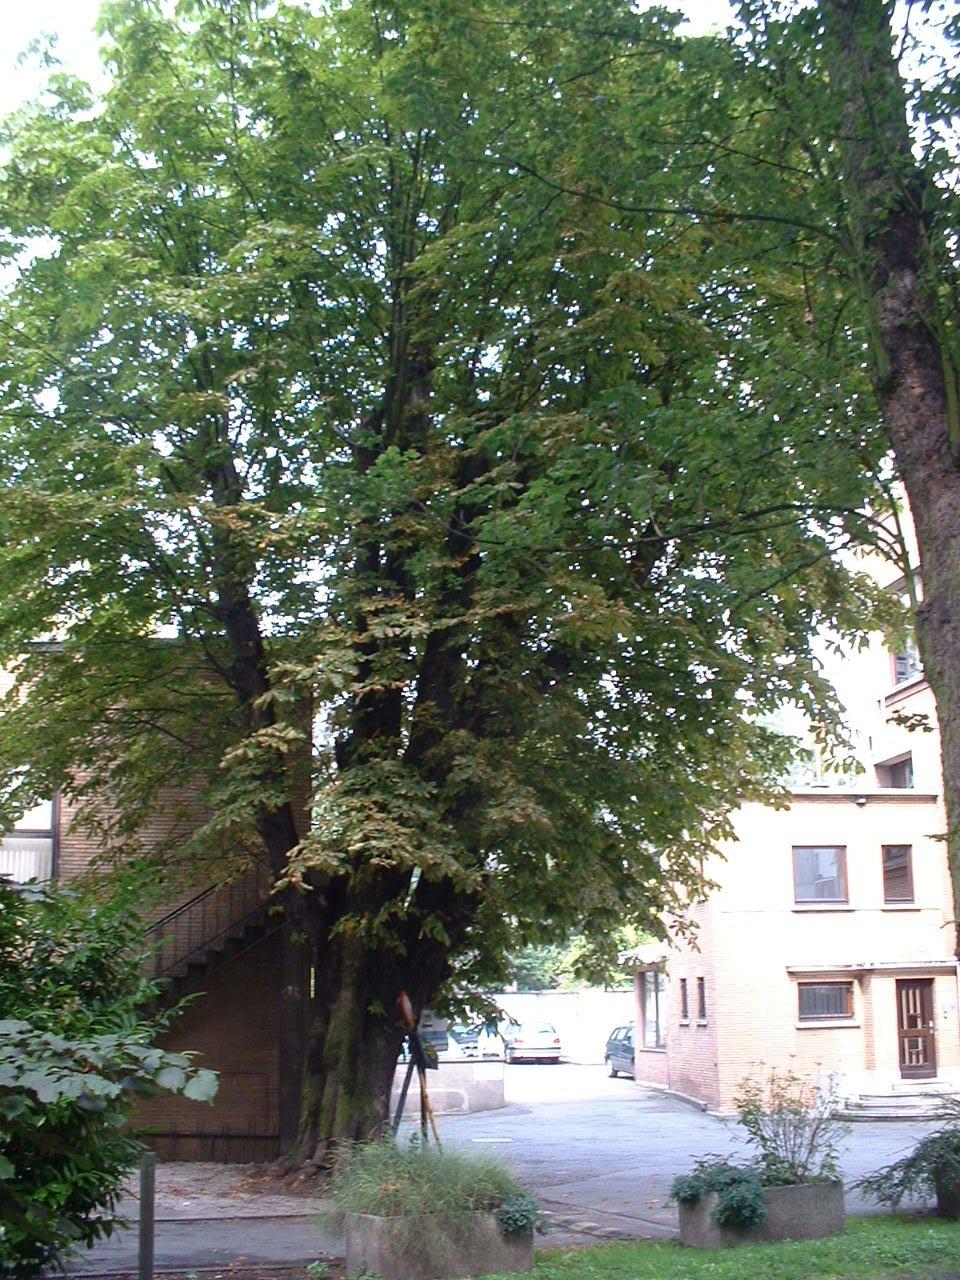 Marronnier commun – Saint-Gilles, Avenue Brugmann, 29 –  19 Août 2002